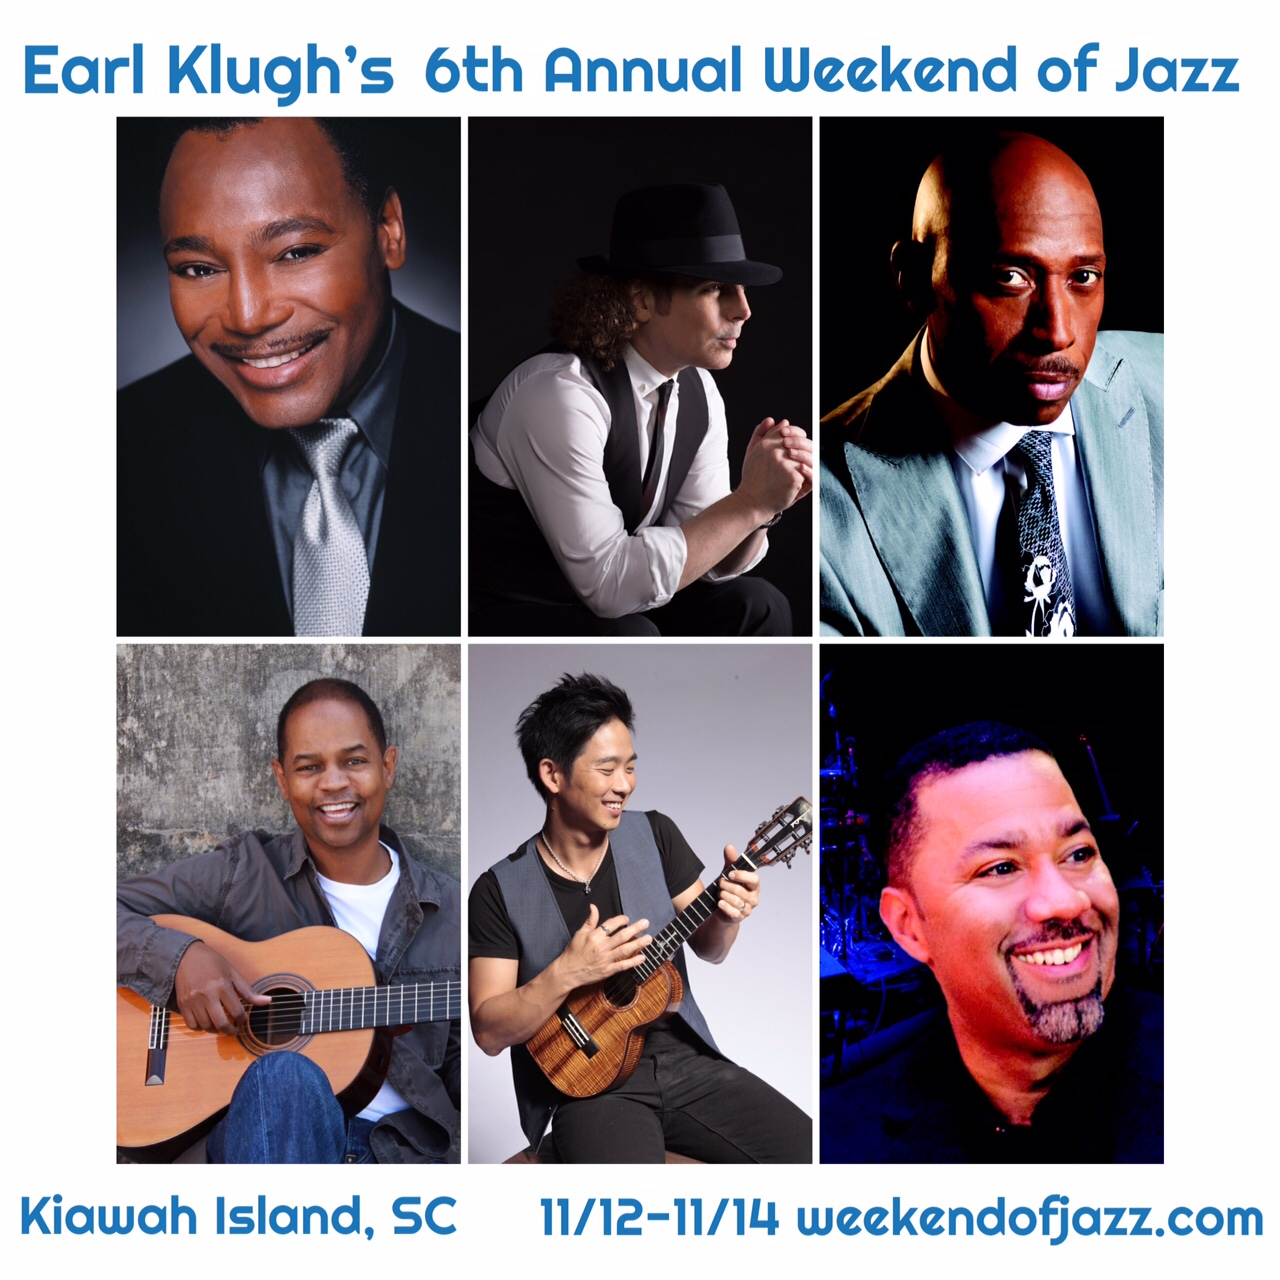 Earl Klugh's 6th Annual Weekend of Jazz at Kiawah Island!